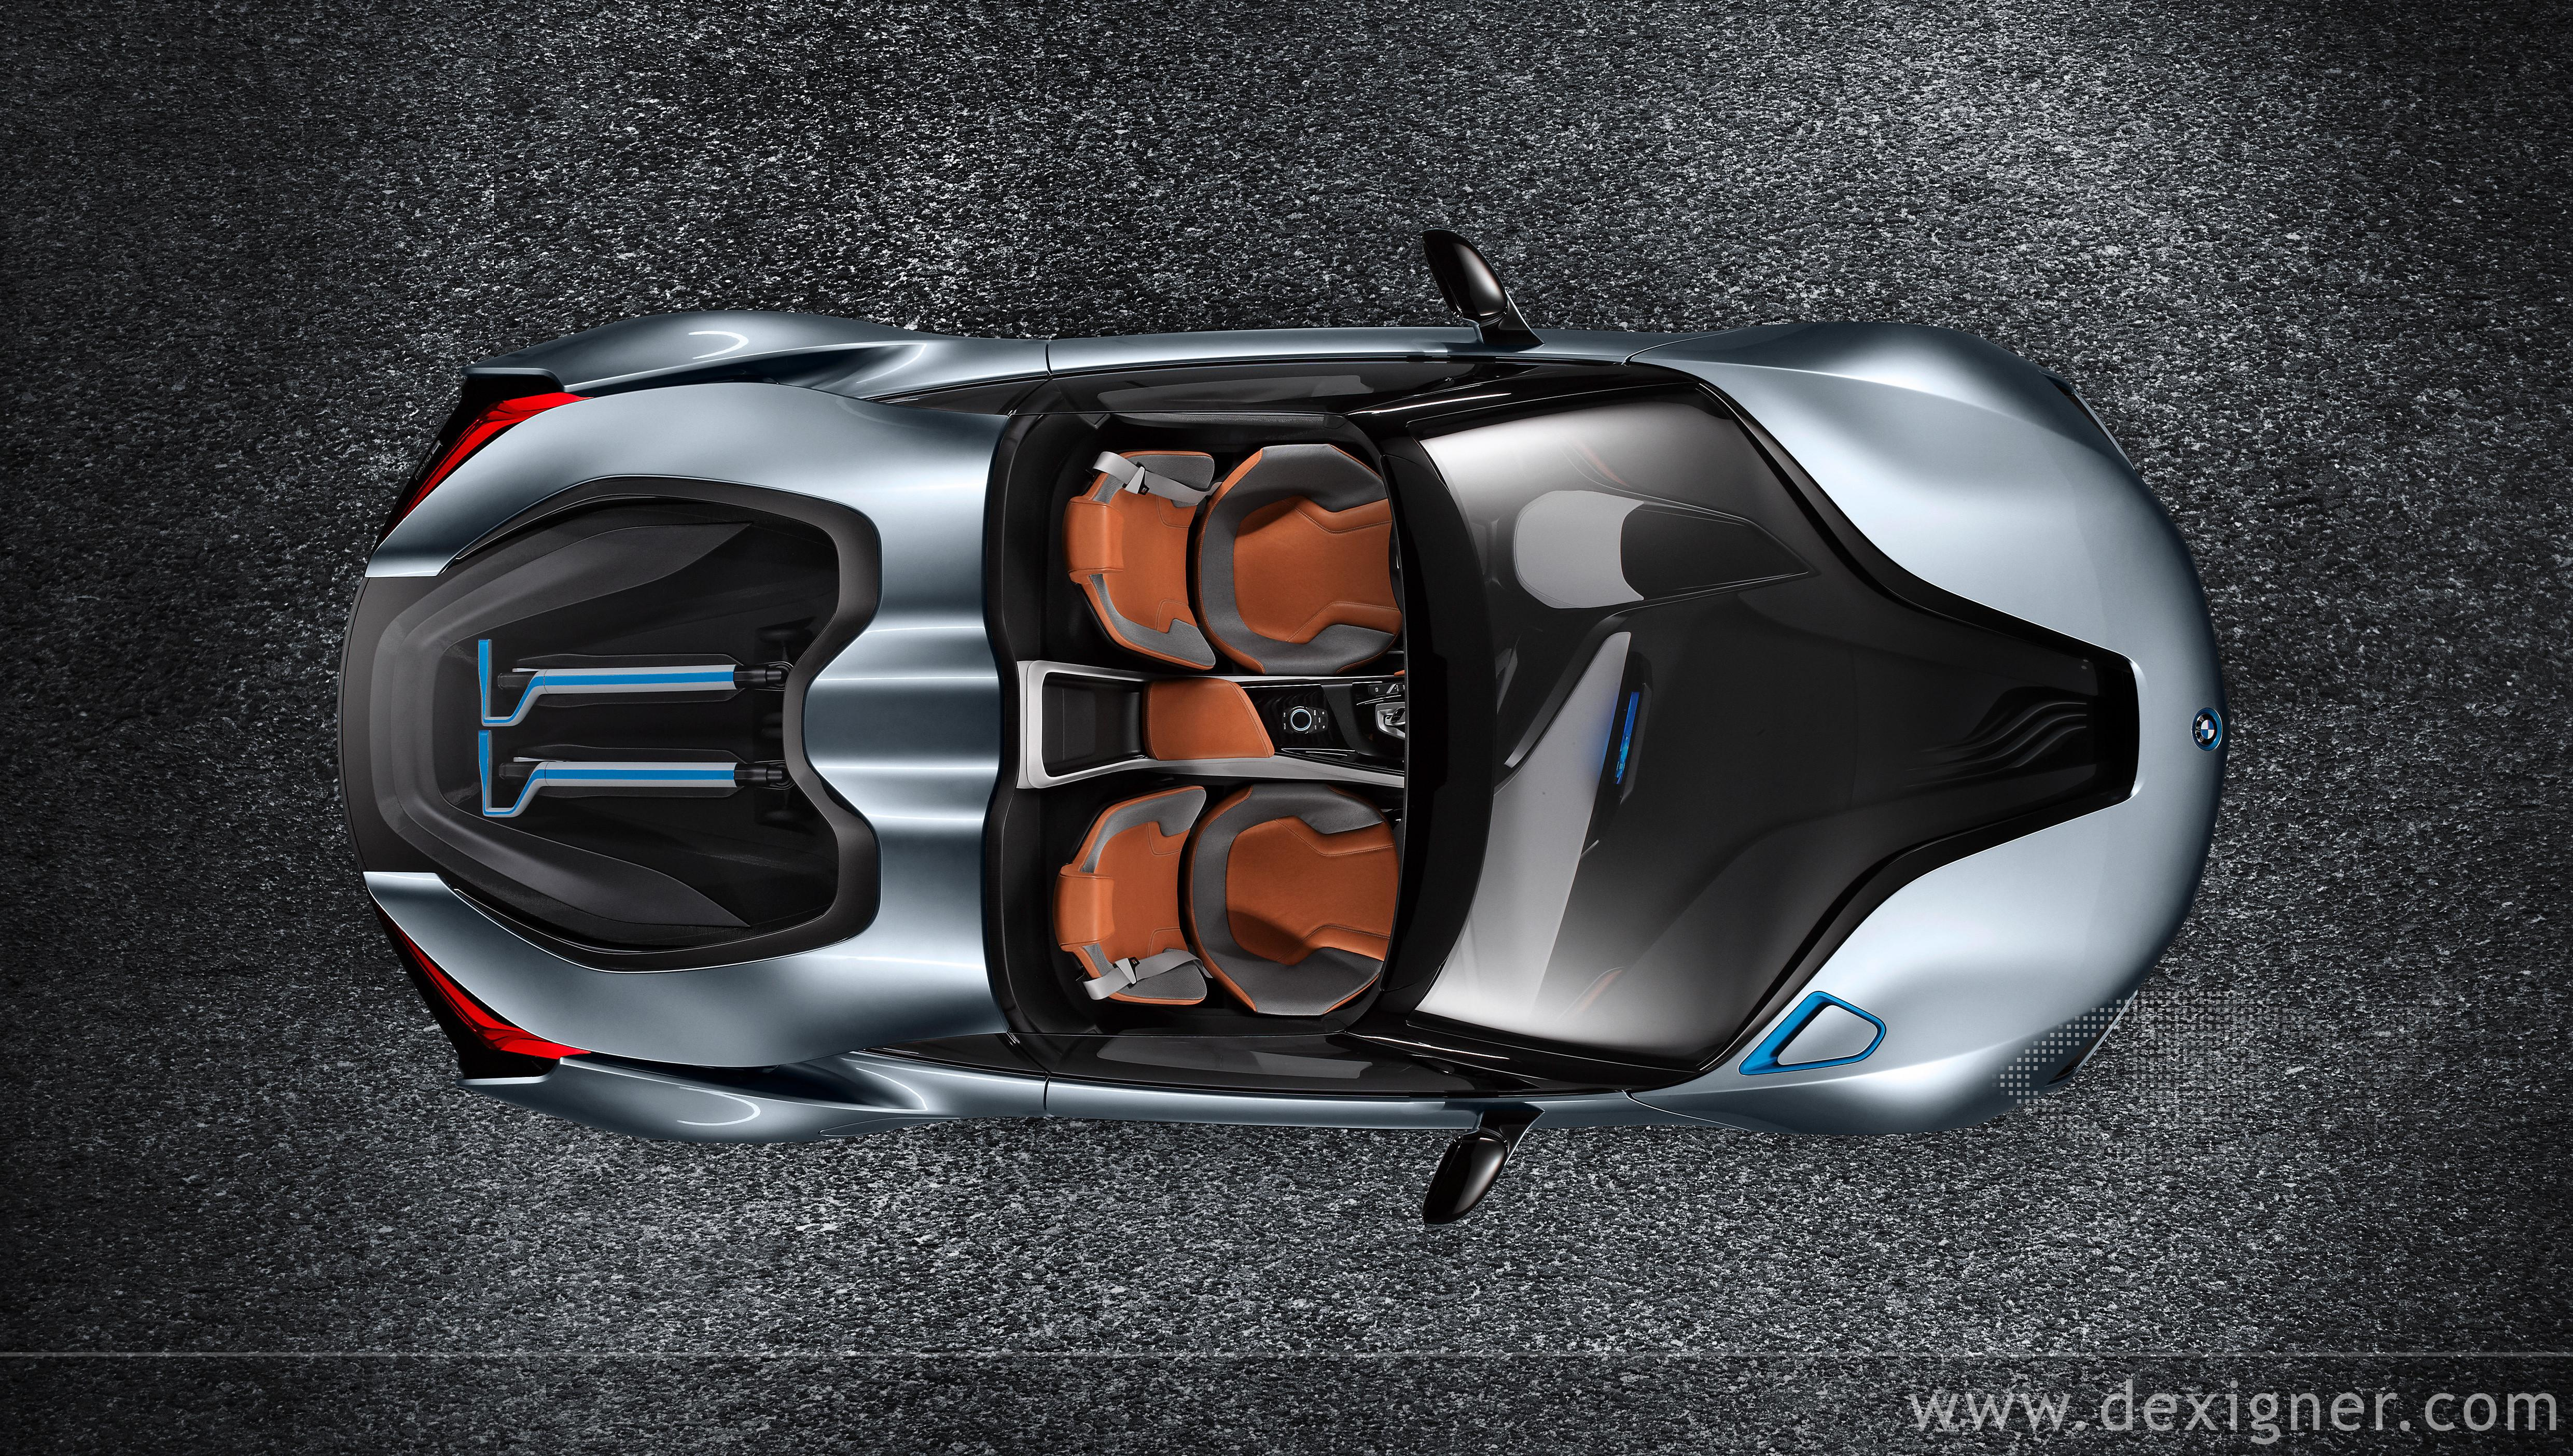 BMW_i8_Concept_Spyder_06.jpg (4961×2808)